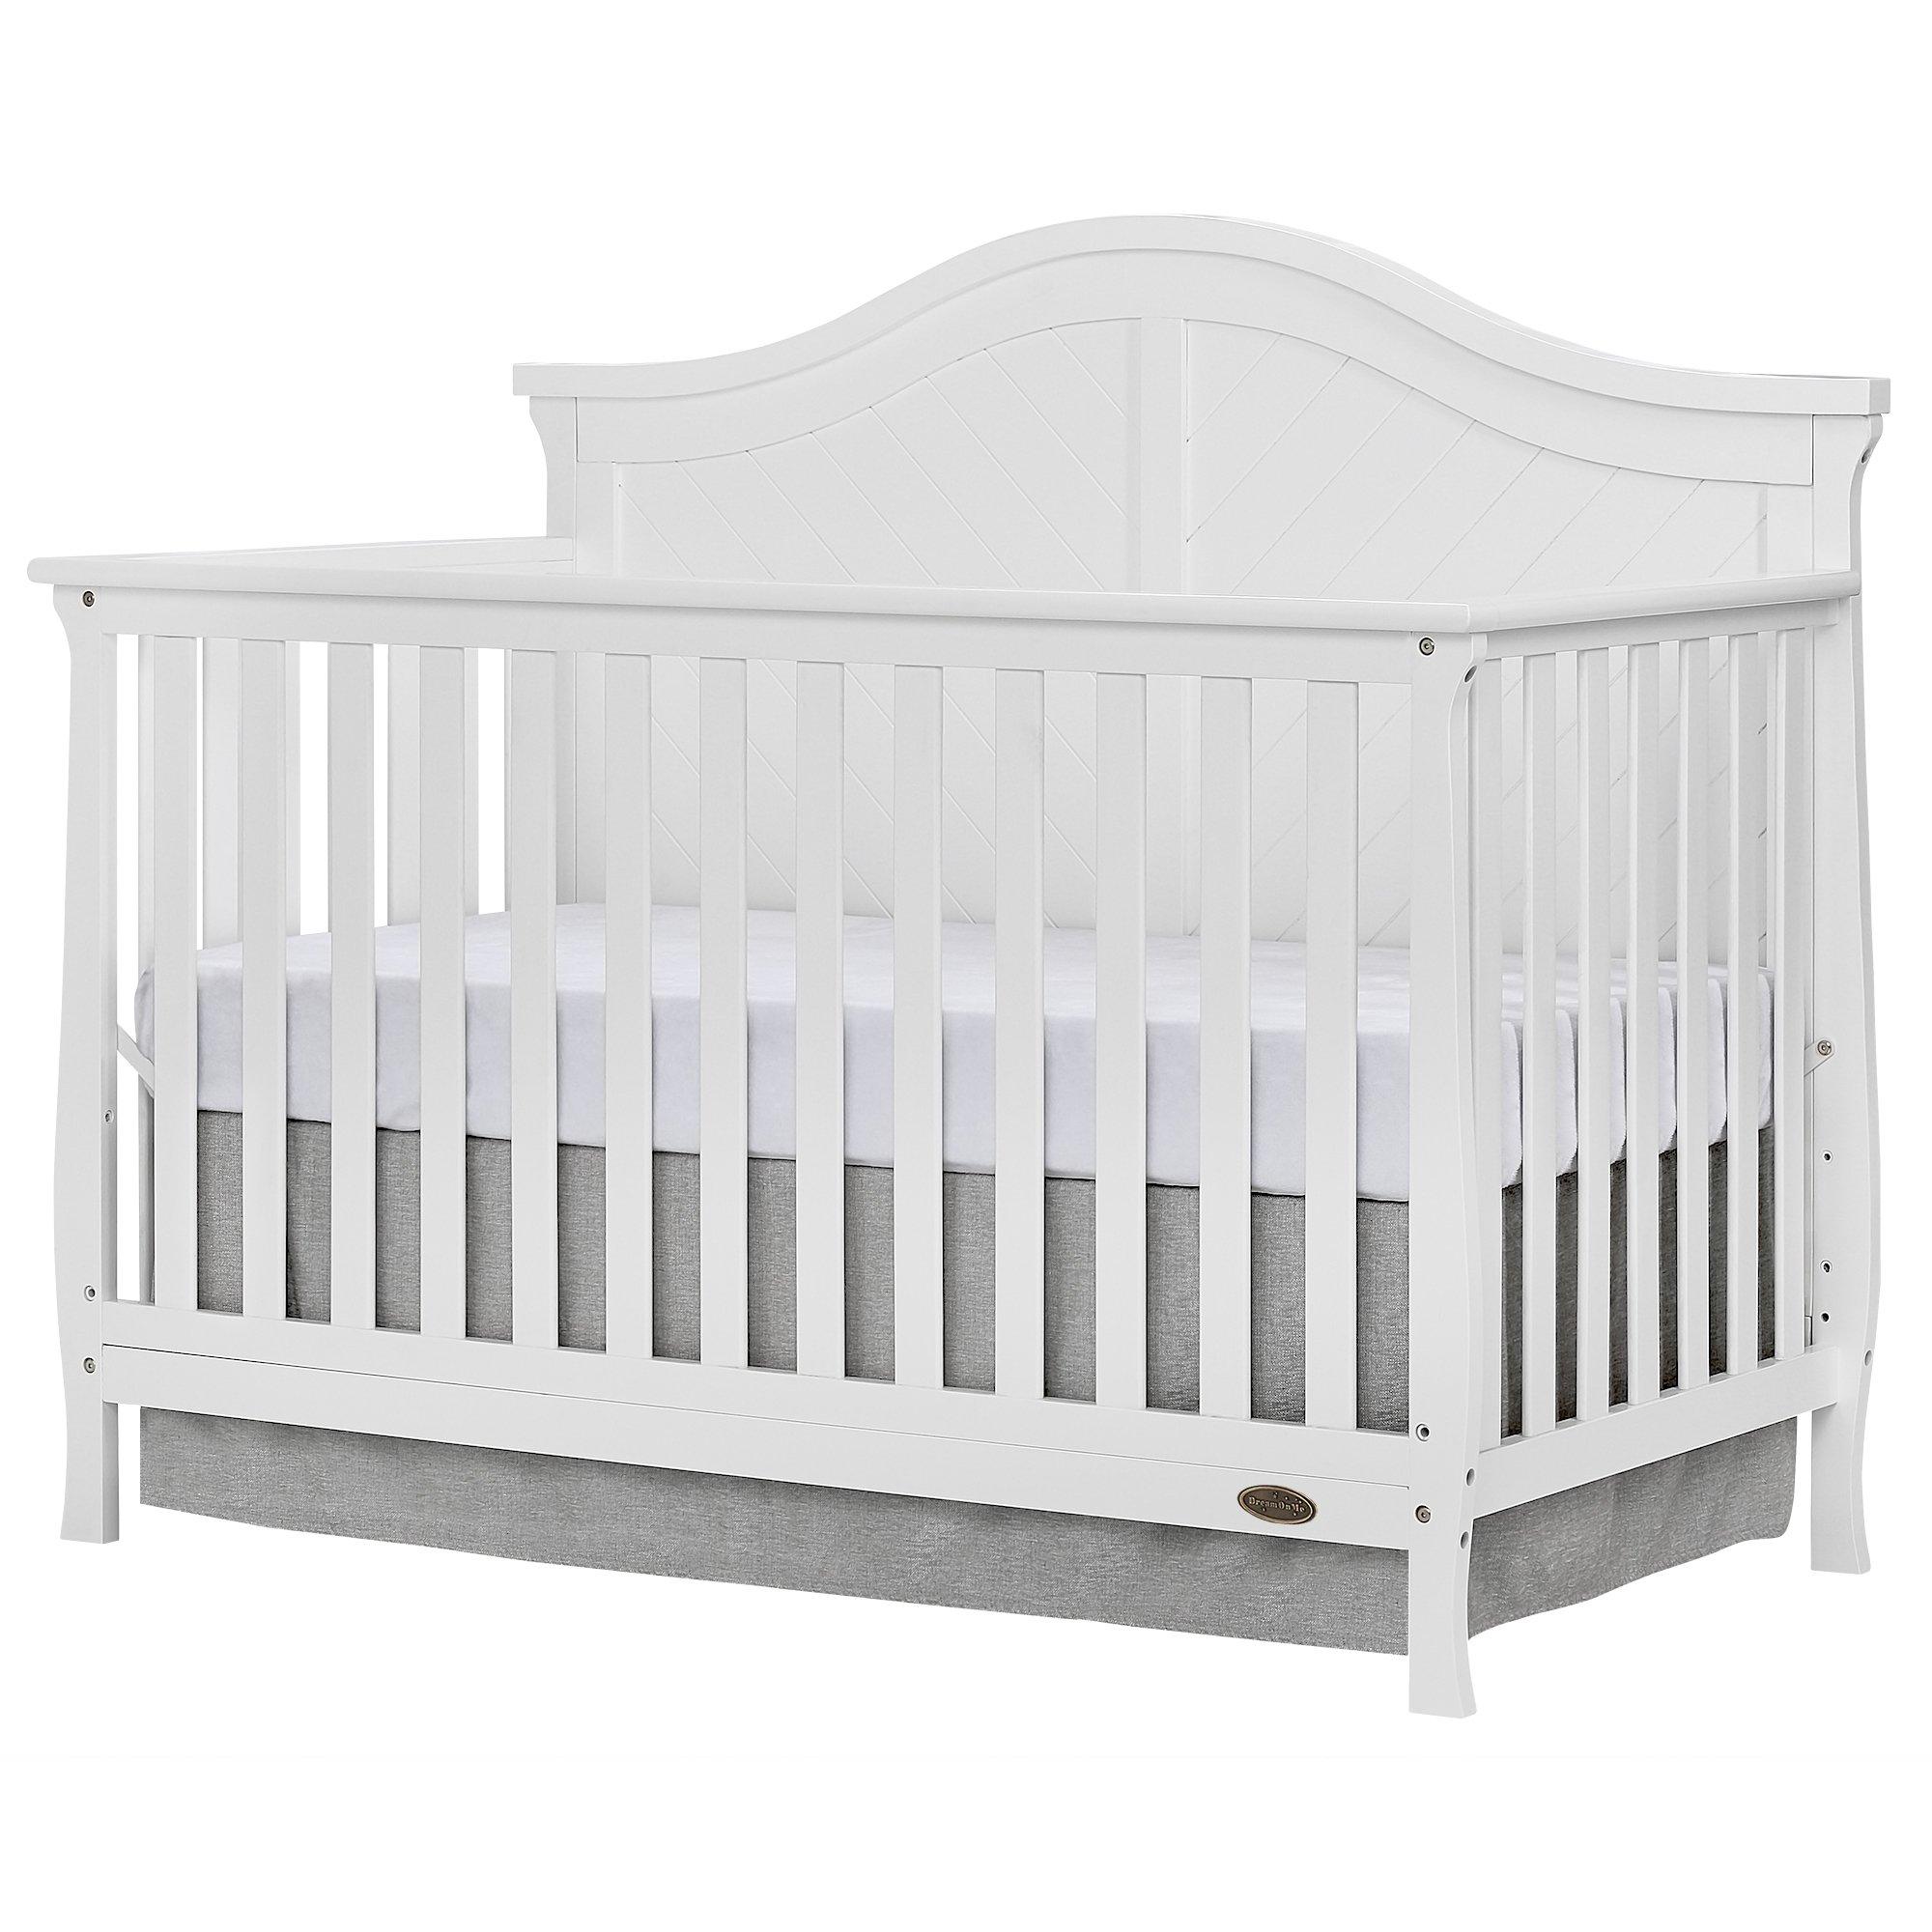 Dream On Me Kaylin 5 in 1 Convertible Crib, White